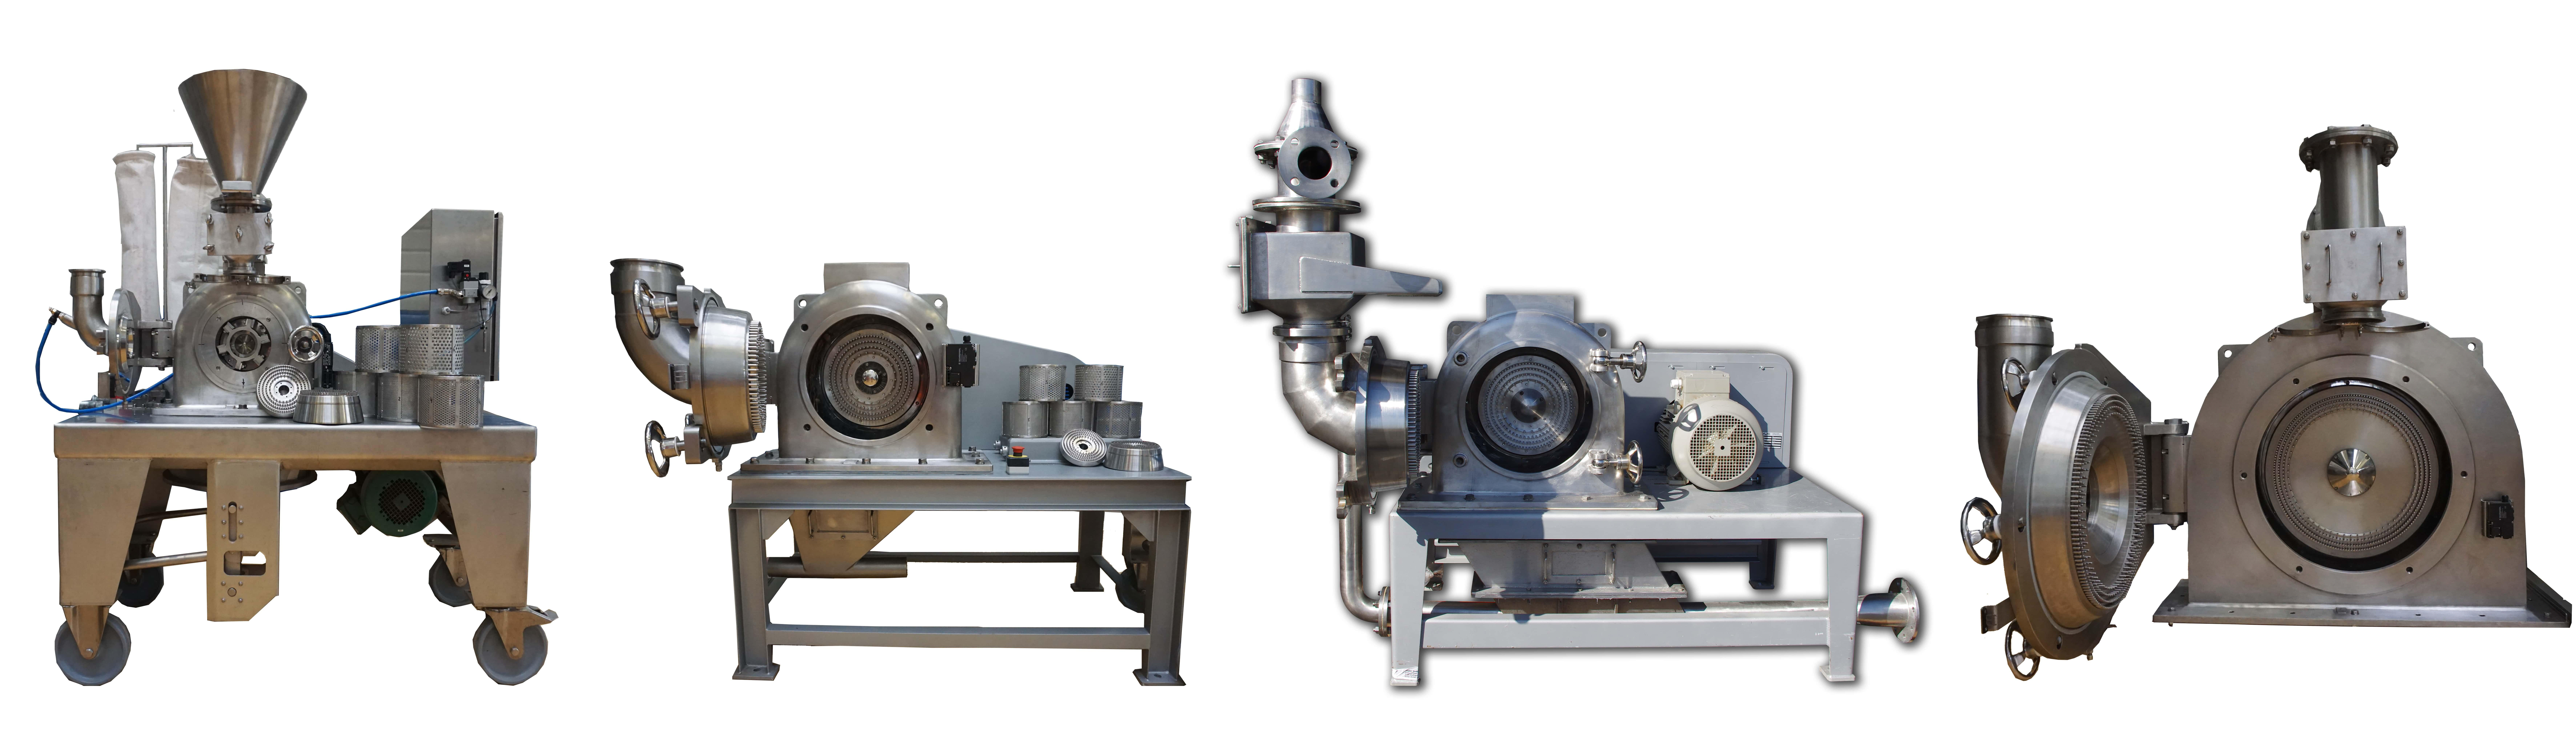 Broyeur industriel ouvert Palamatic Process